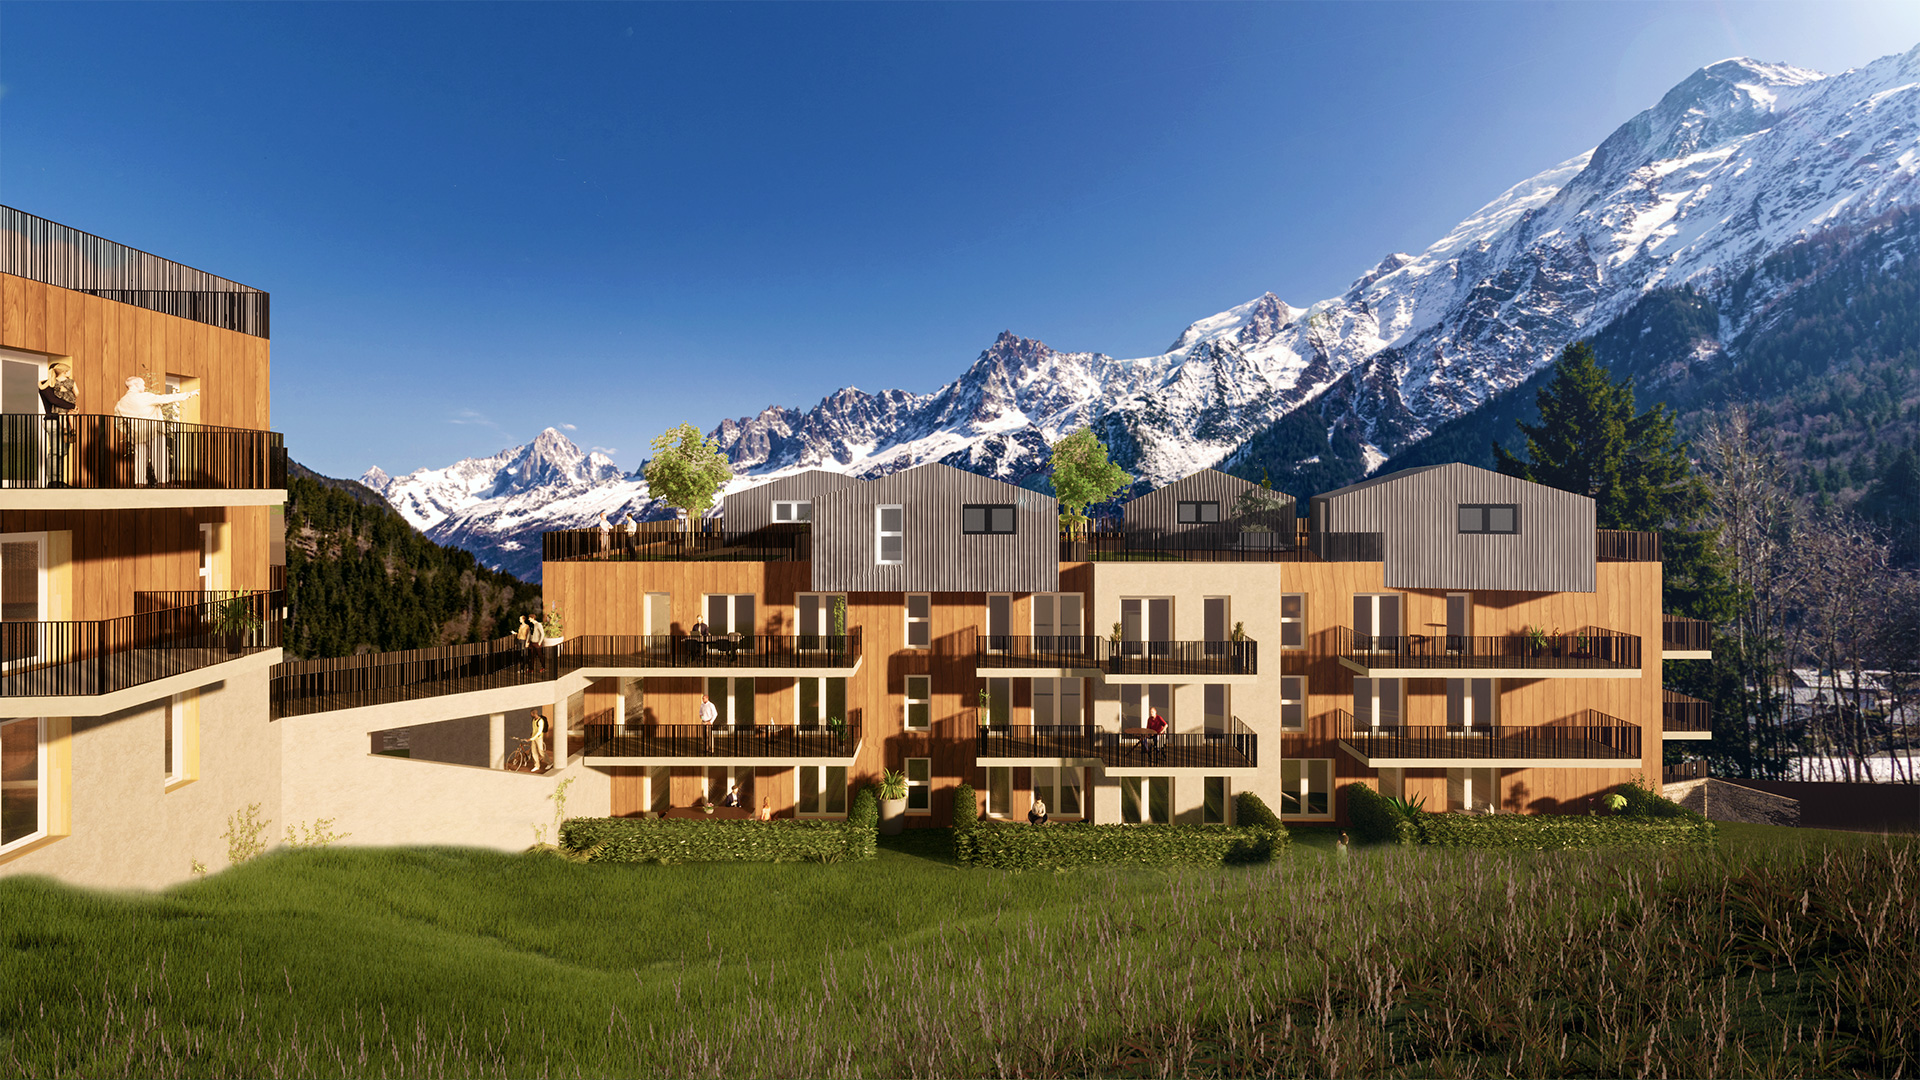 Les Mazots de Kayla Apartments, France